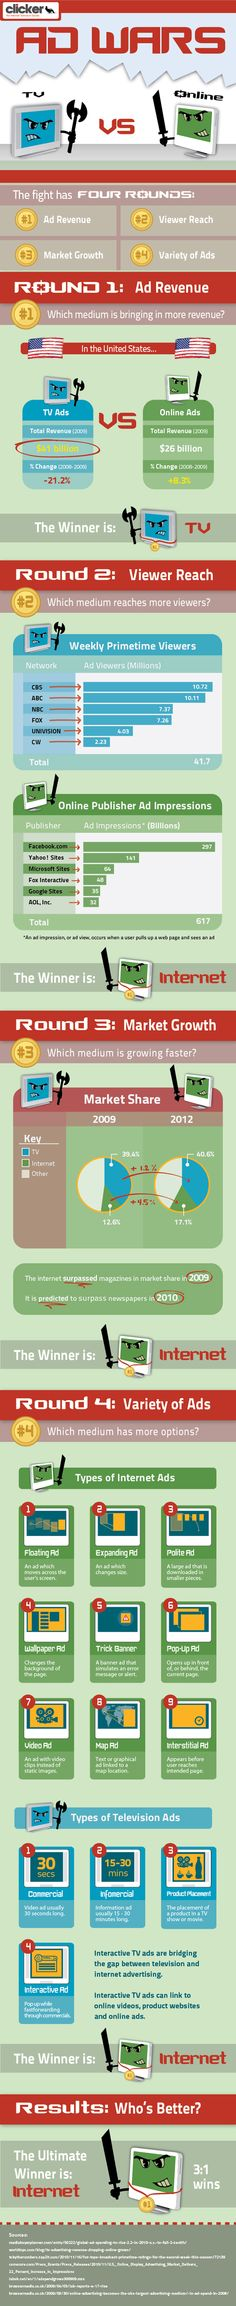 Reklam Savaşları  http://sosyalmedya.co/reklam-savaslari-infographic/